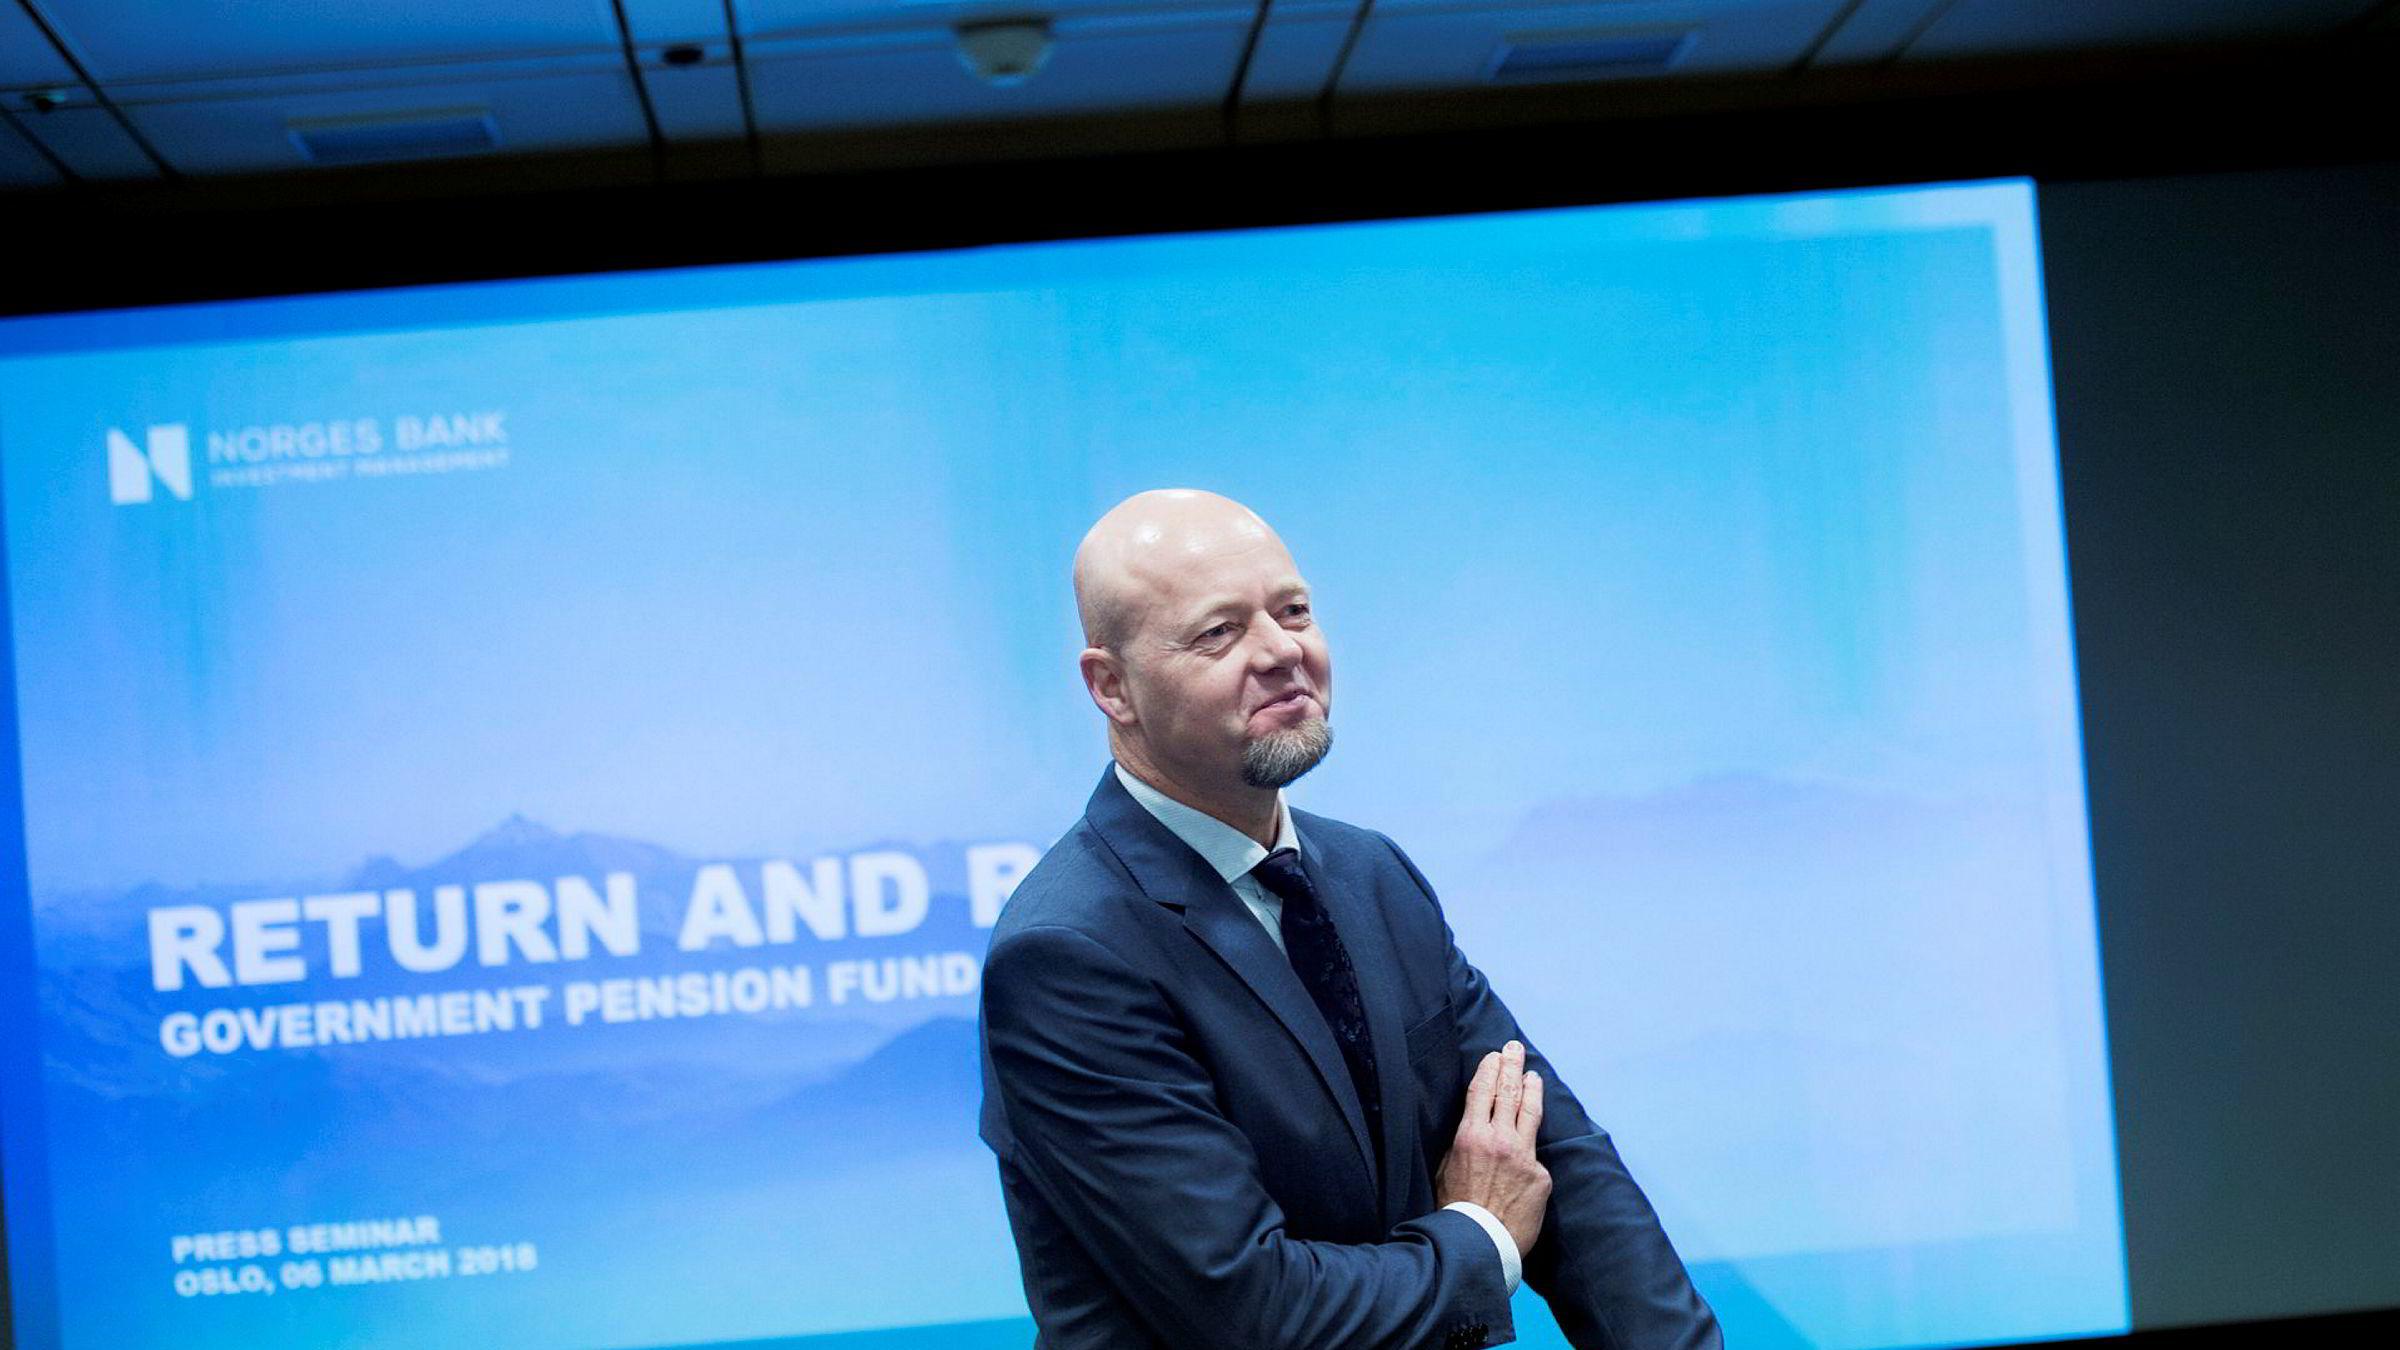 Yngve Slyngstad la frem Oljefondets rapport om avkastning og risiko.